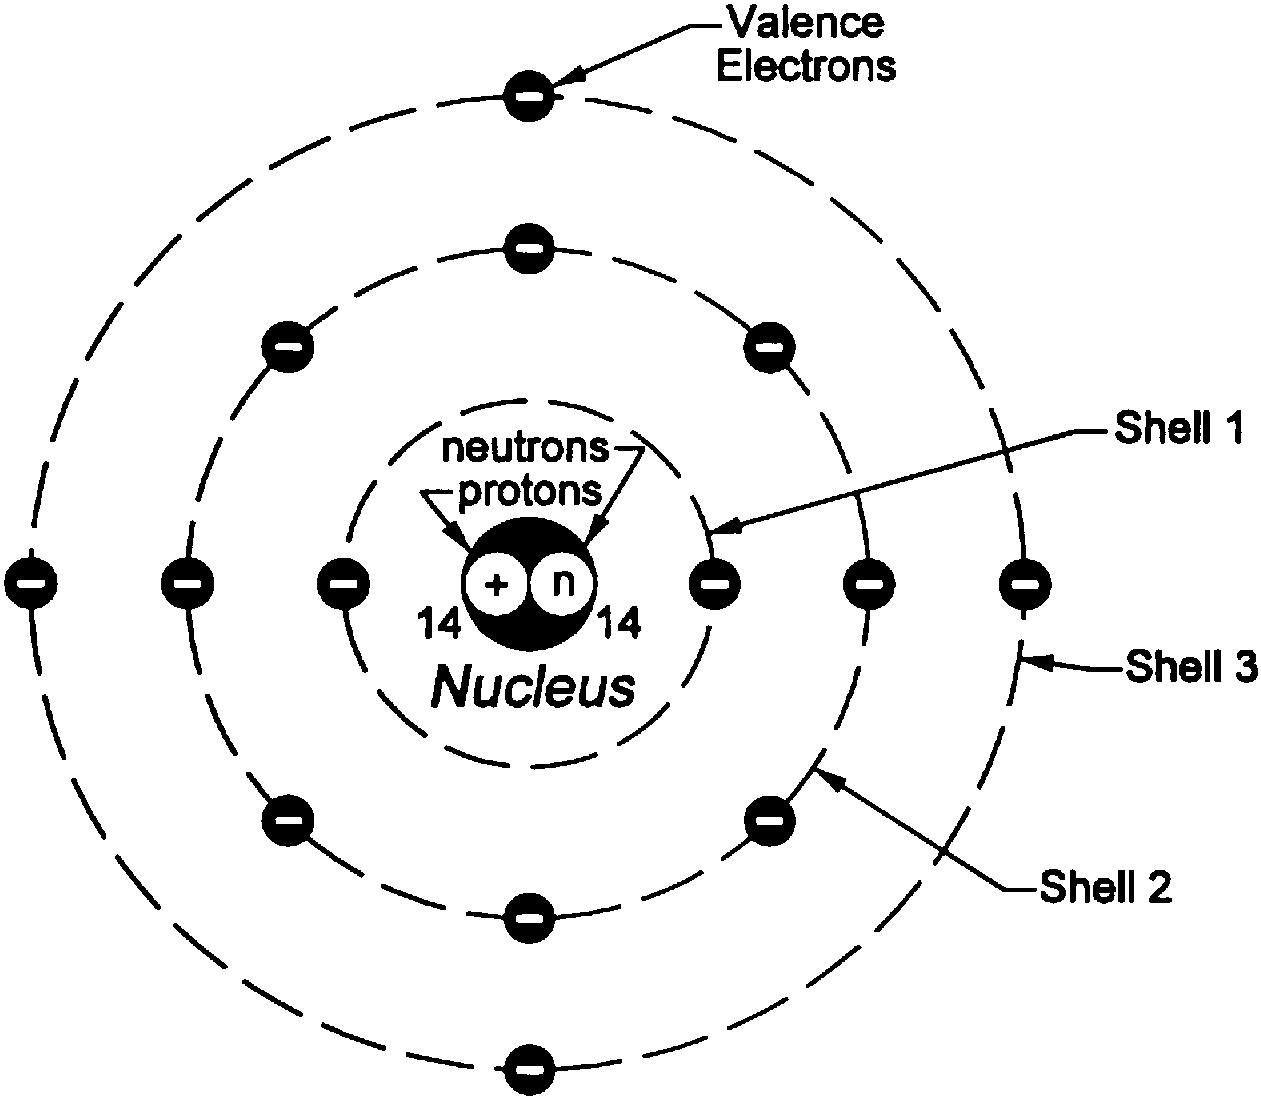 medium resolution of bohr diagram for silicon simple wiring post rh 29 asiagourmet igb de bohr diagram for nitrogen bohr diagram for sulfur